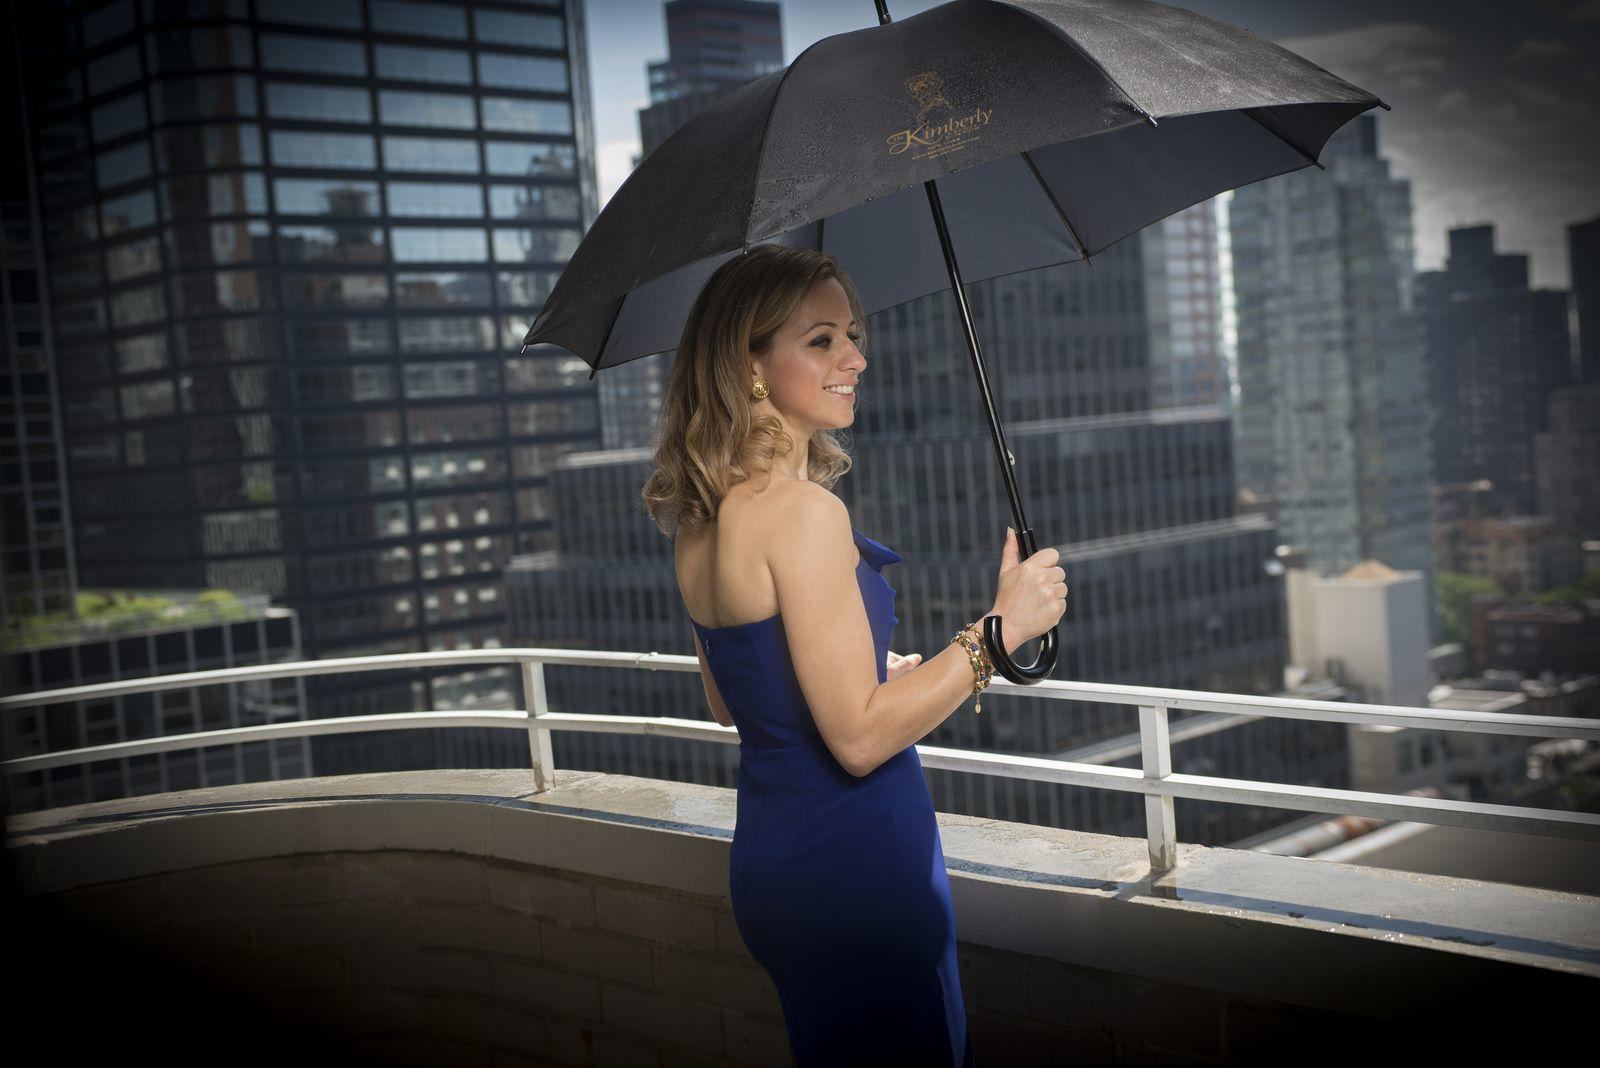 Balcony Rain Umbrella